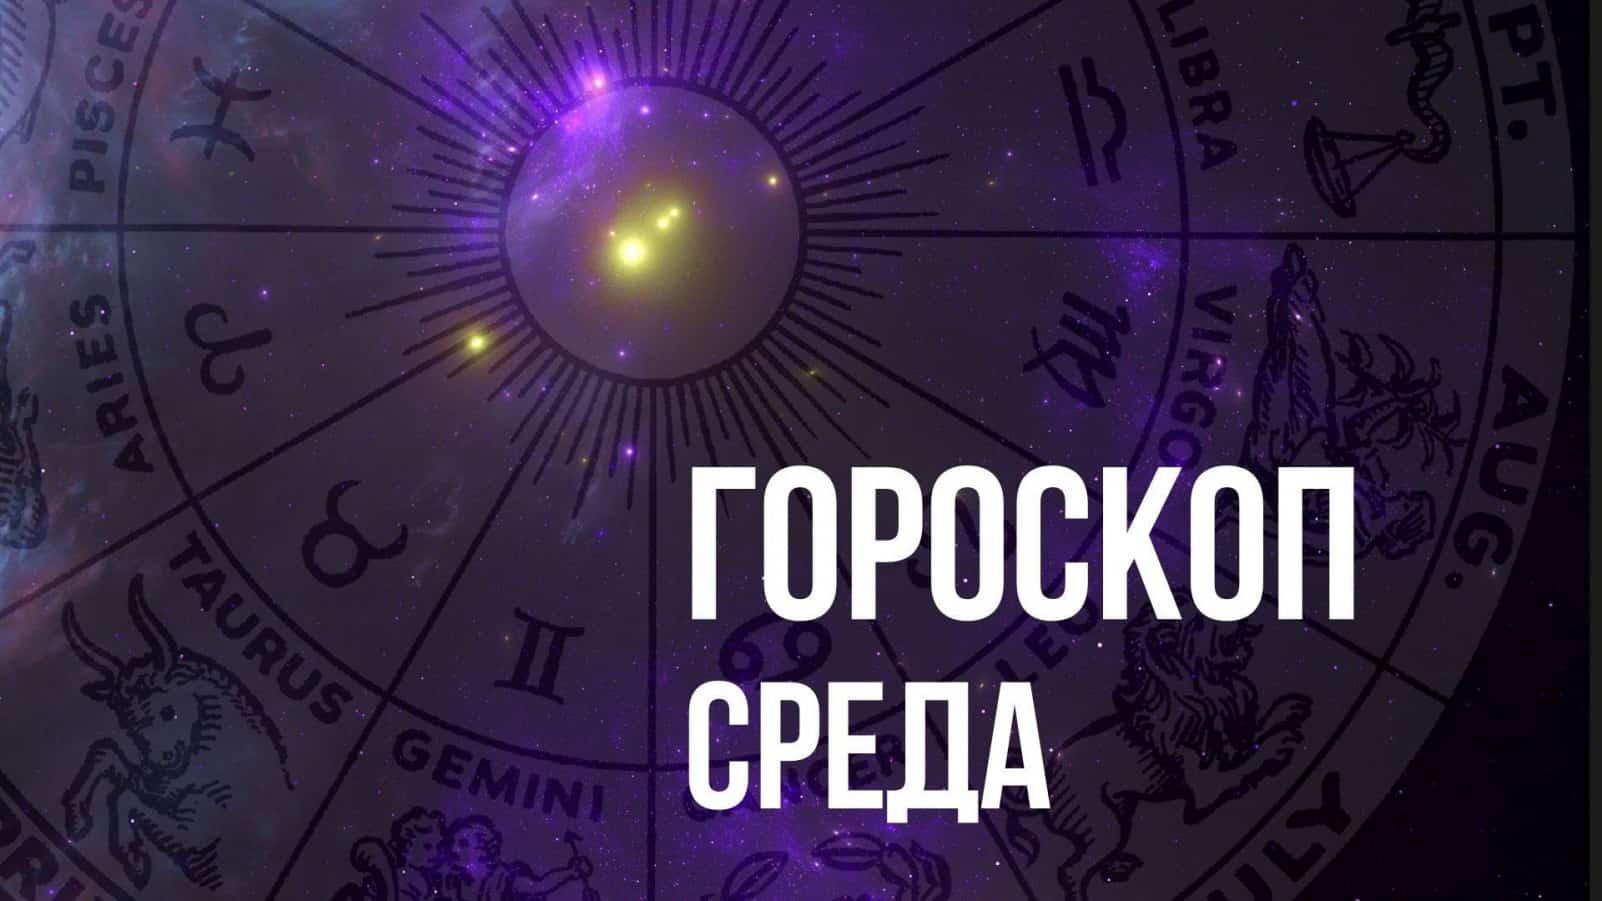 Гороскоп на среду 21 апреля для каждого Знака Зодиака